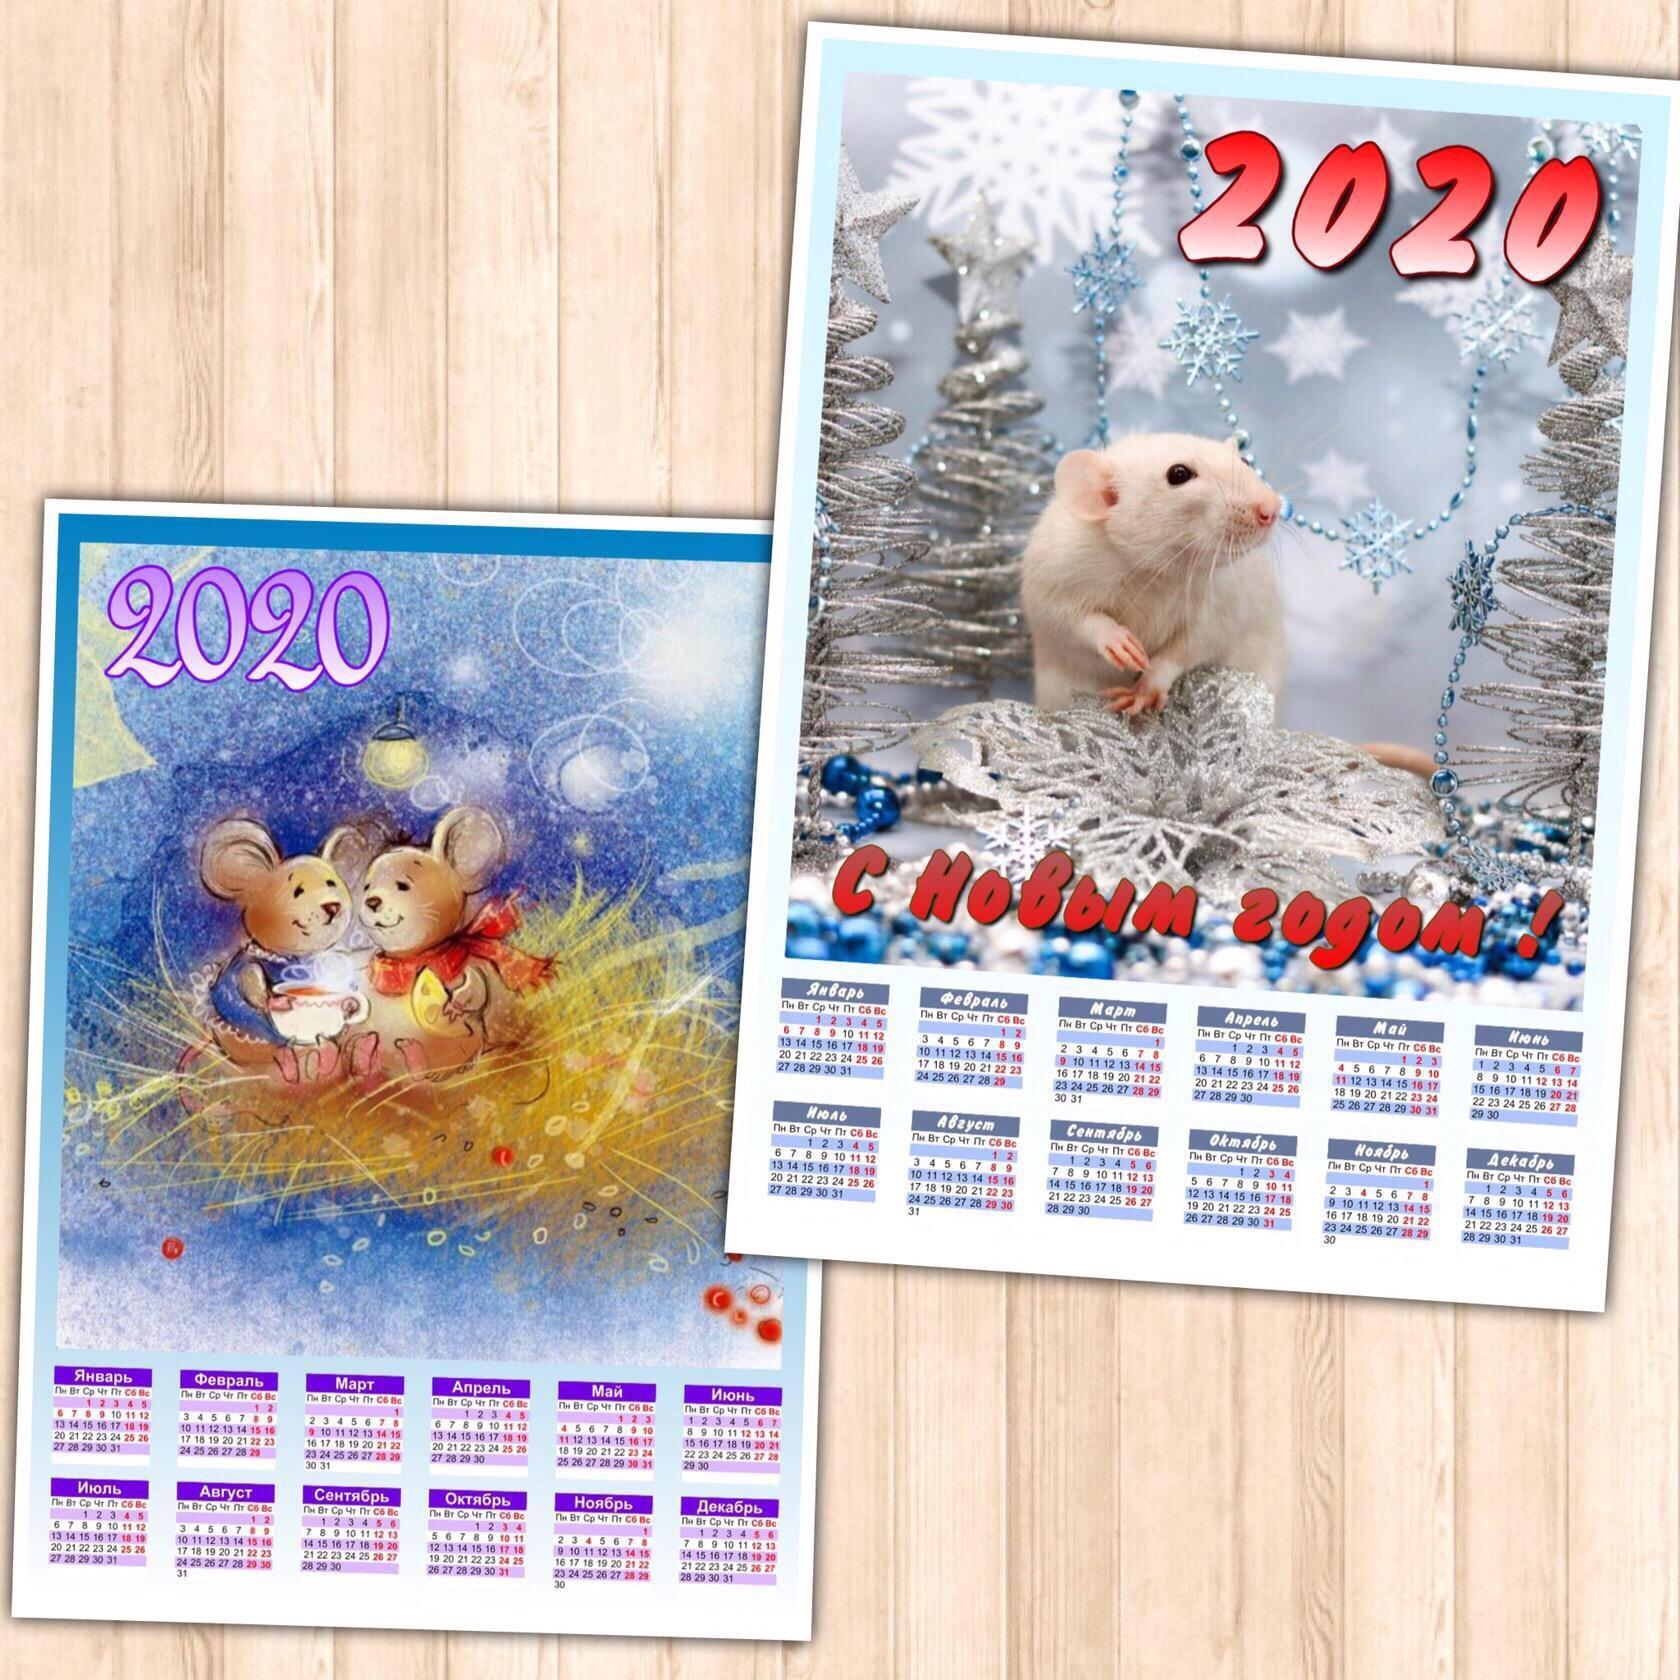 Календари с поздравлениями